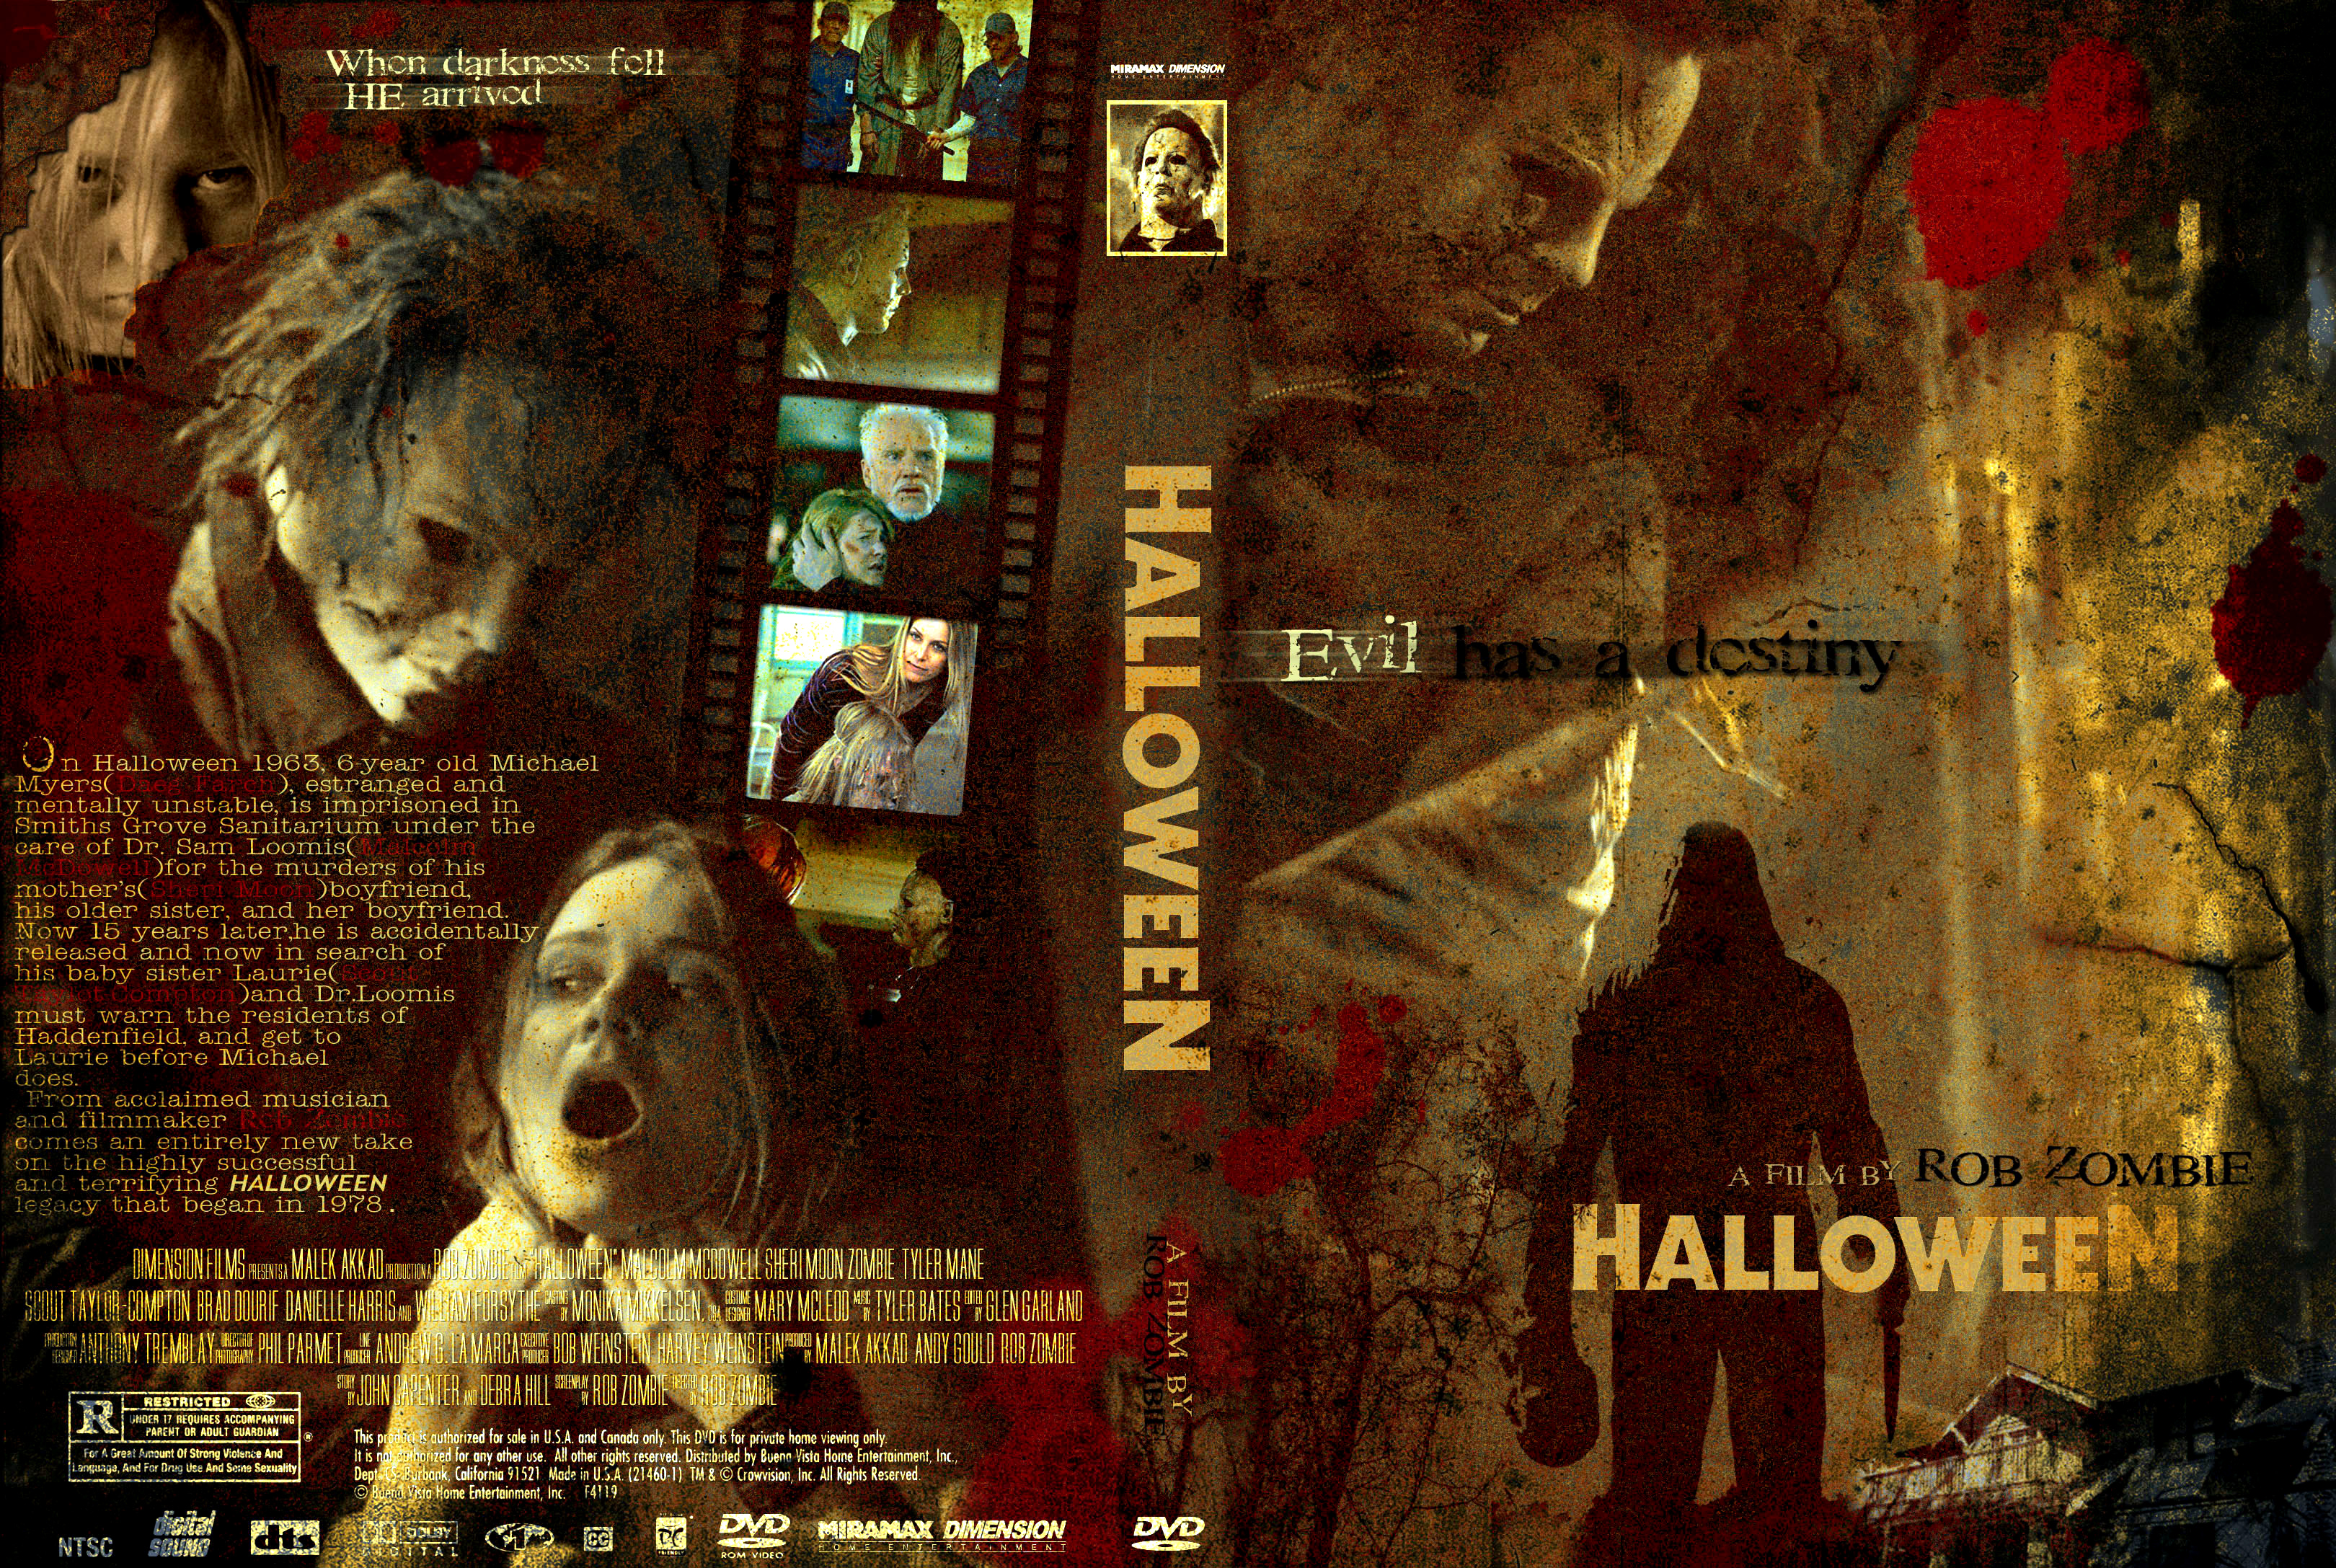 Halloween 2007 Remake